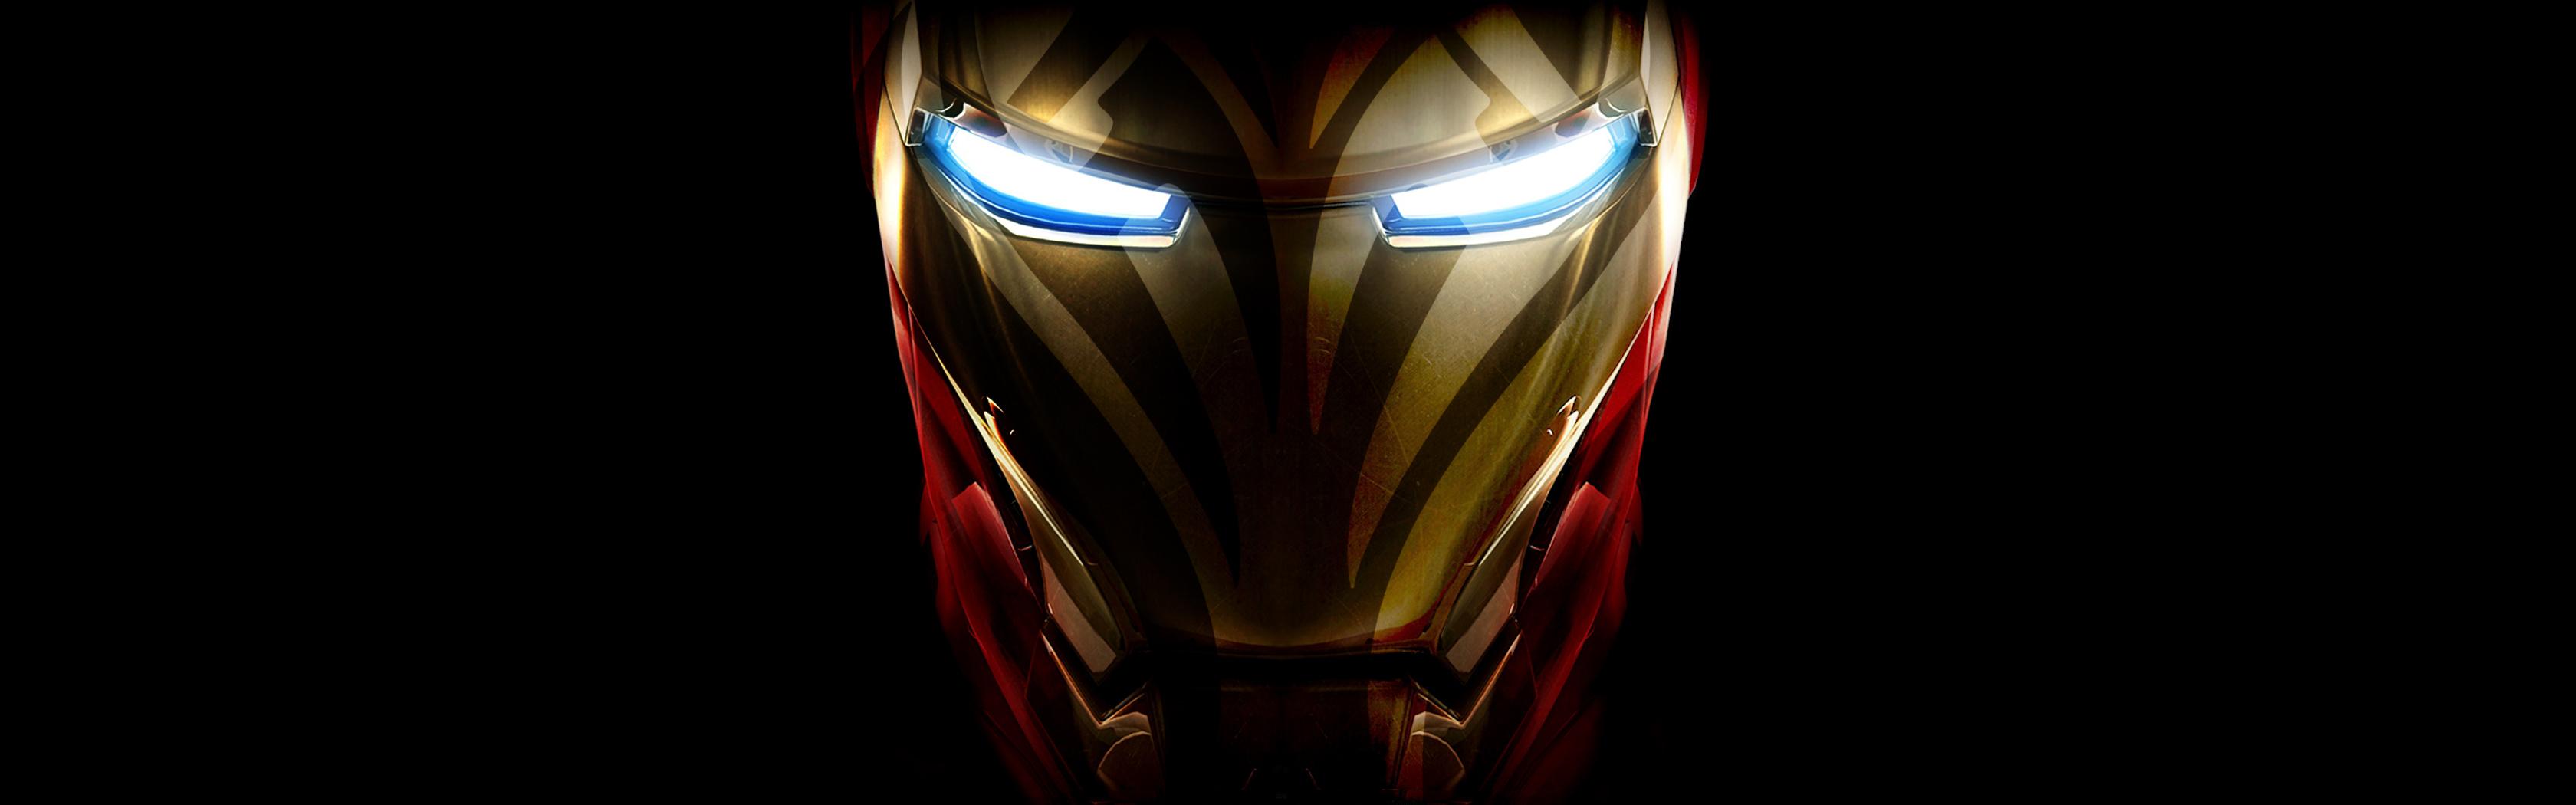 iron man hd wallpapers 18 Iron Man HD Wallpapers 3360x1050